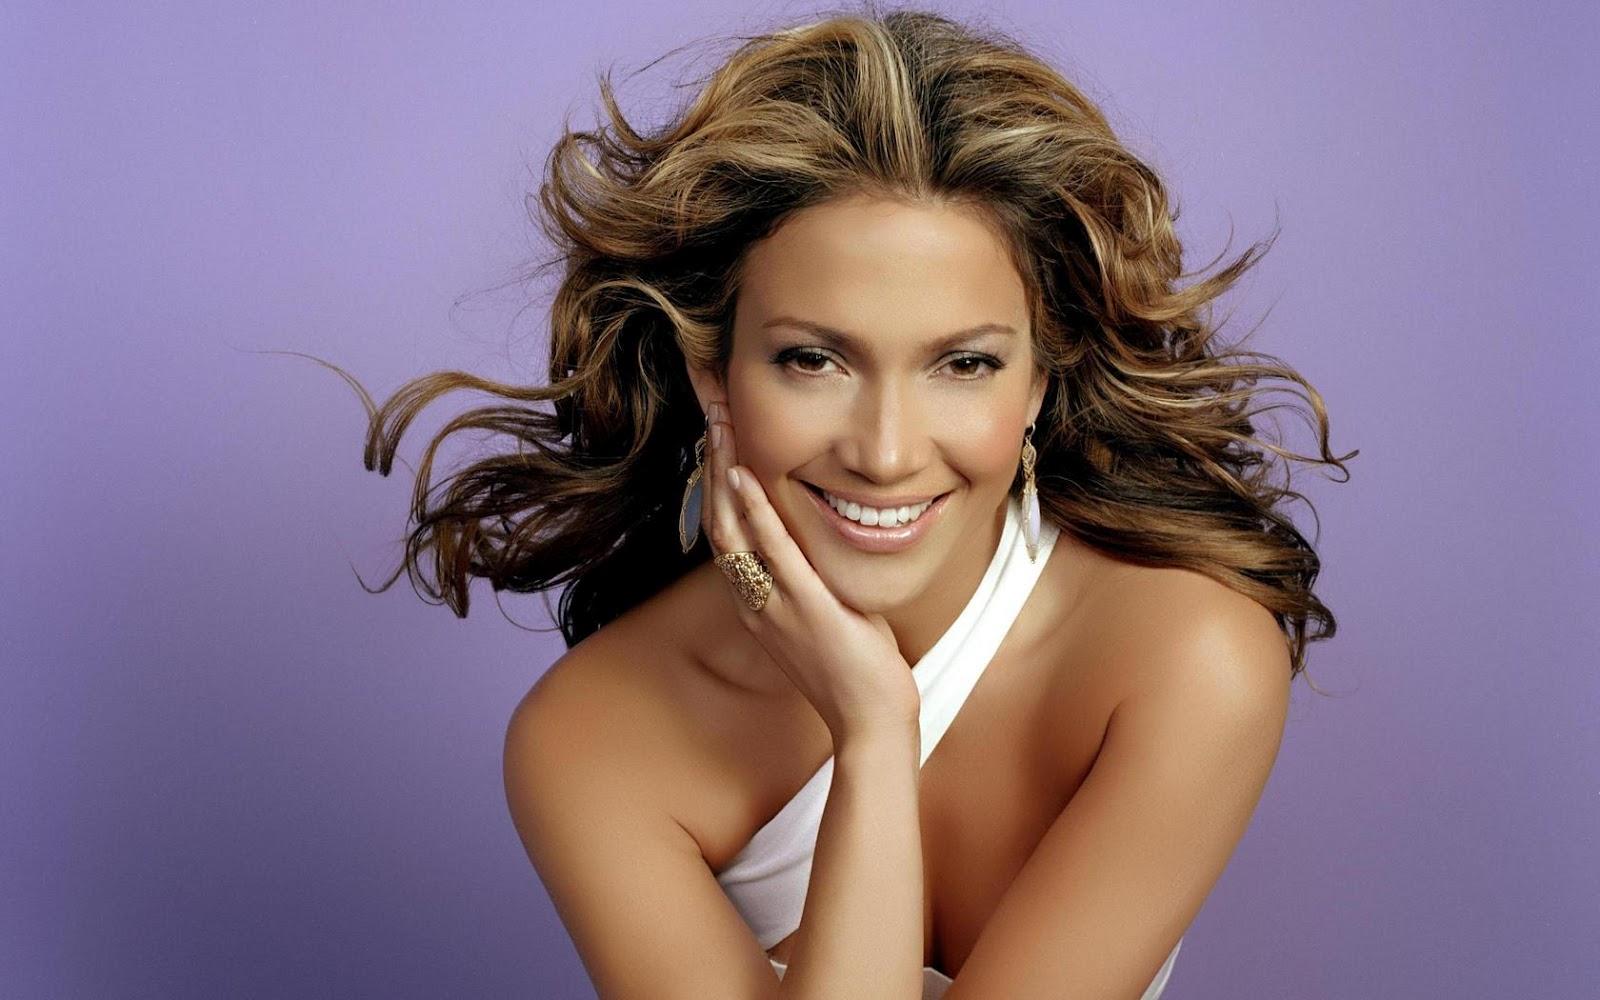 http://4.bp.blogspot.com/-k8b5jBAC-Rk/T14qQ_9h2EI/AAAAAAAAWPg/sa-XNb8ojd4/s1600/Jennifer-Lopez_03.jpg